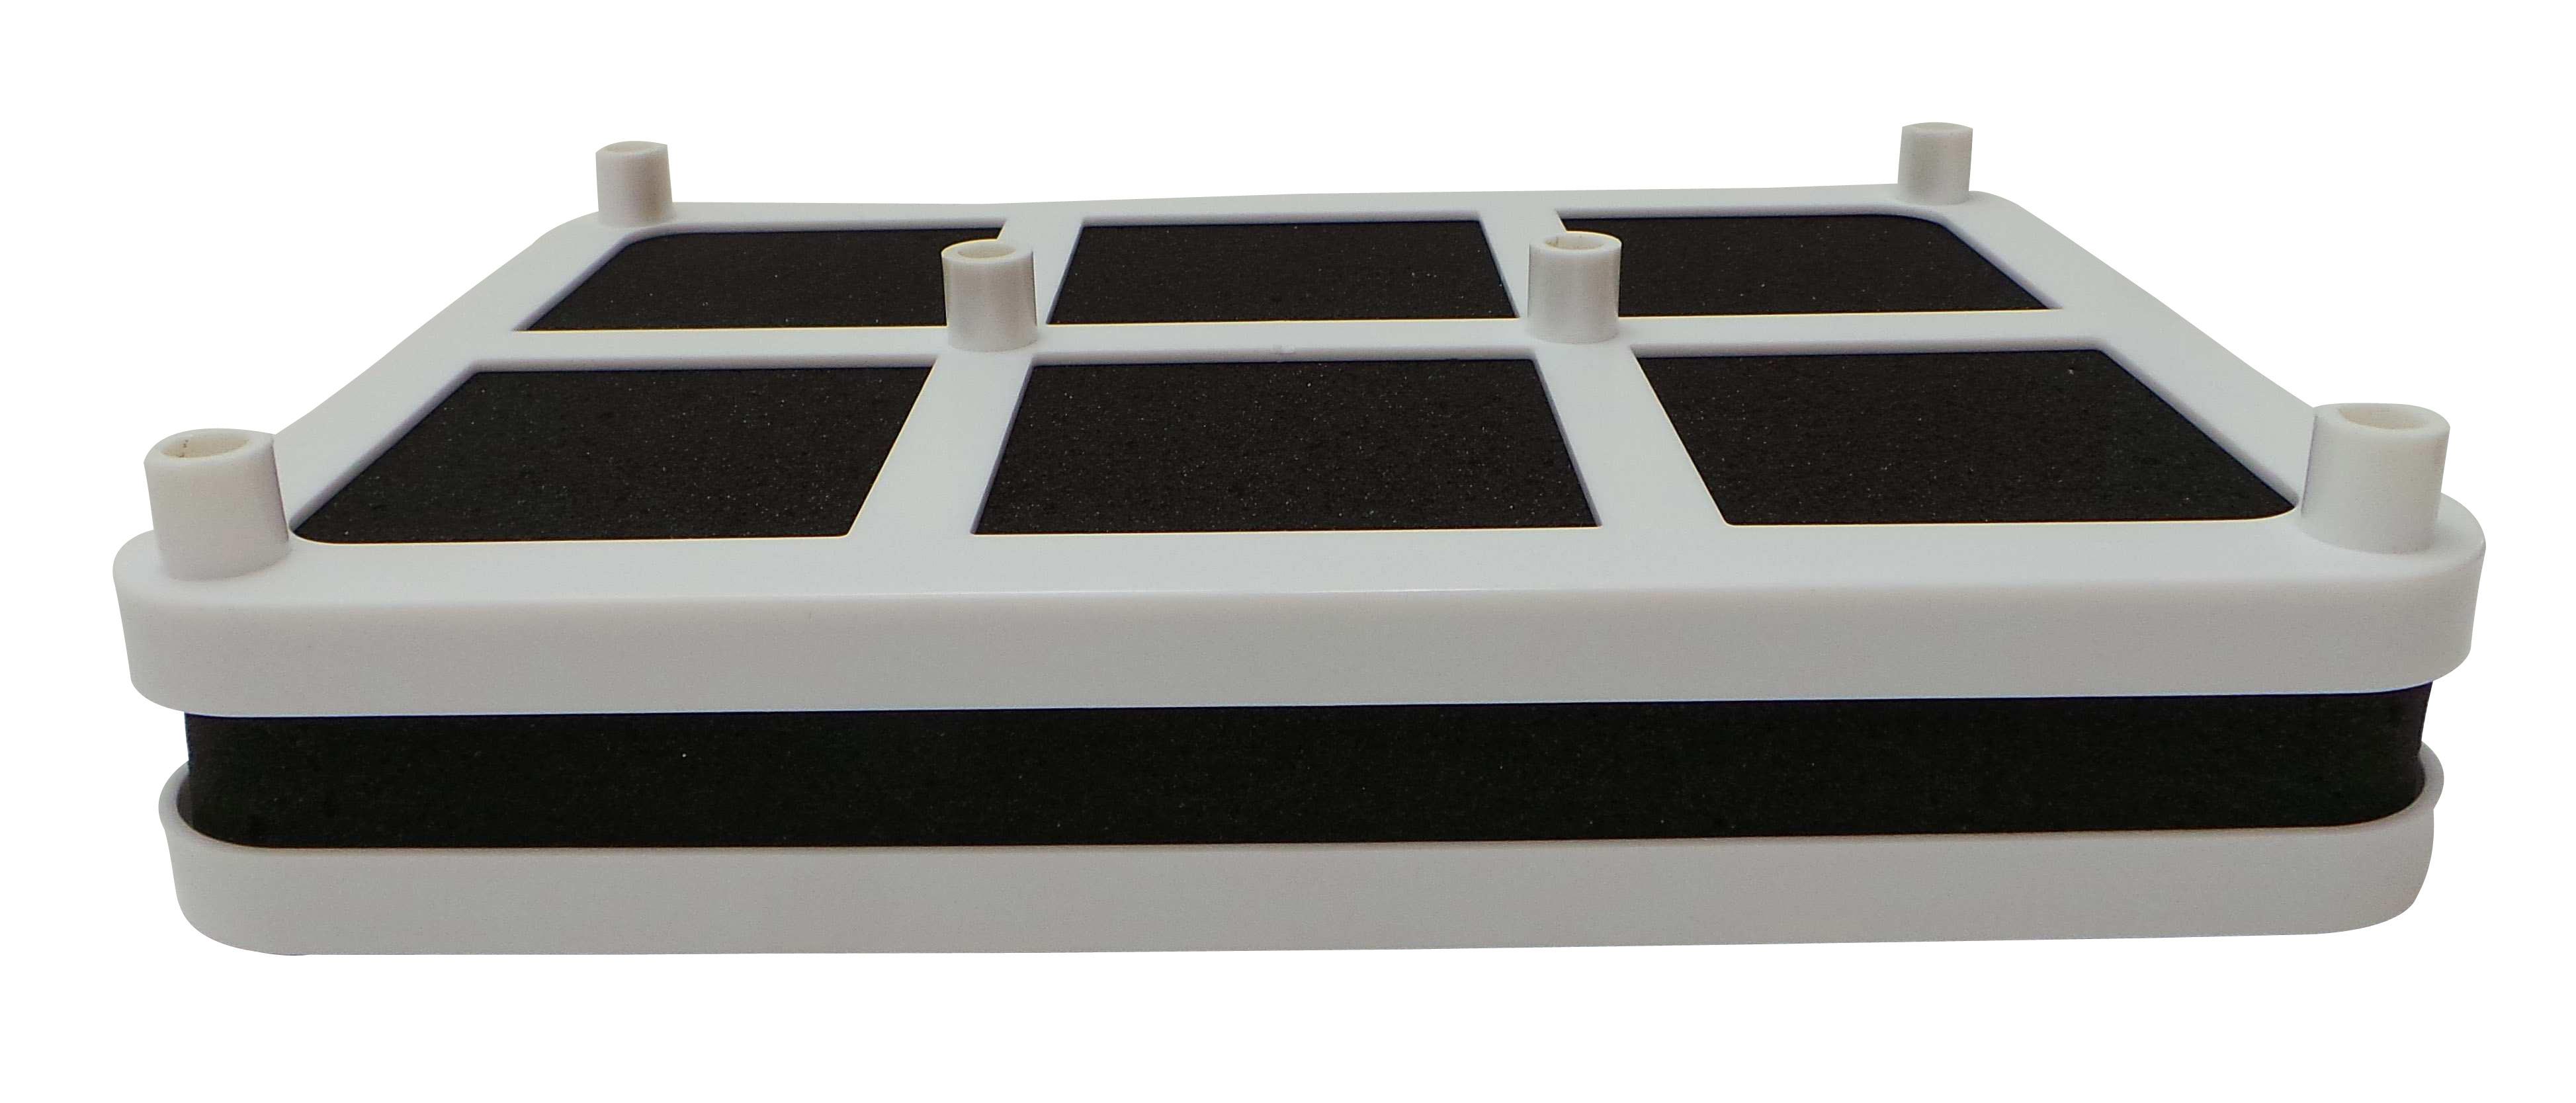 Joblot of 72 Kleeneze Portable Room Humidifiers Stops Air Discomfort #594F44